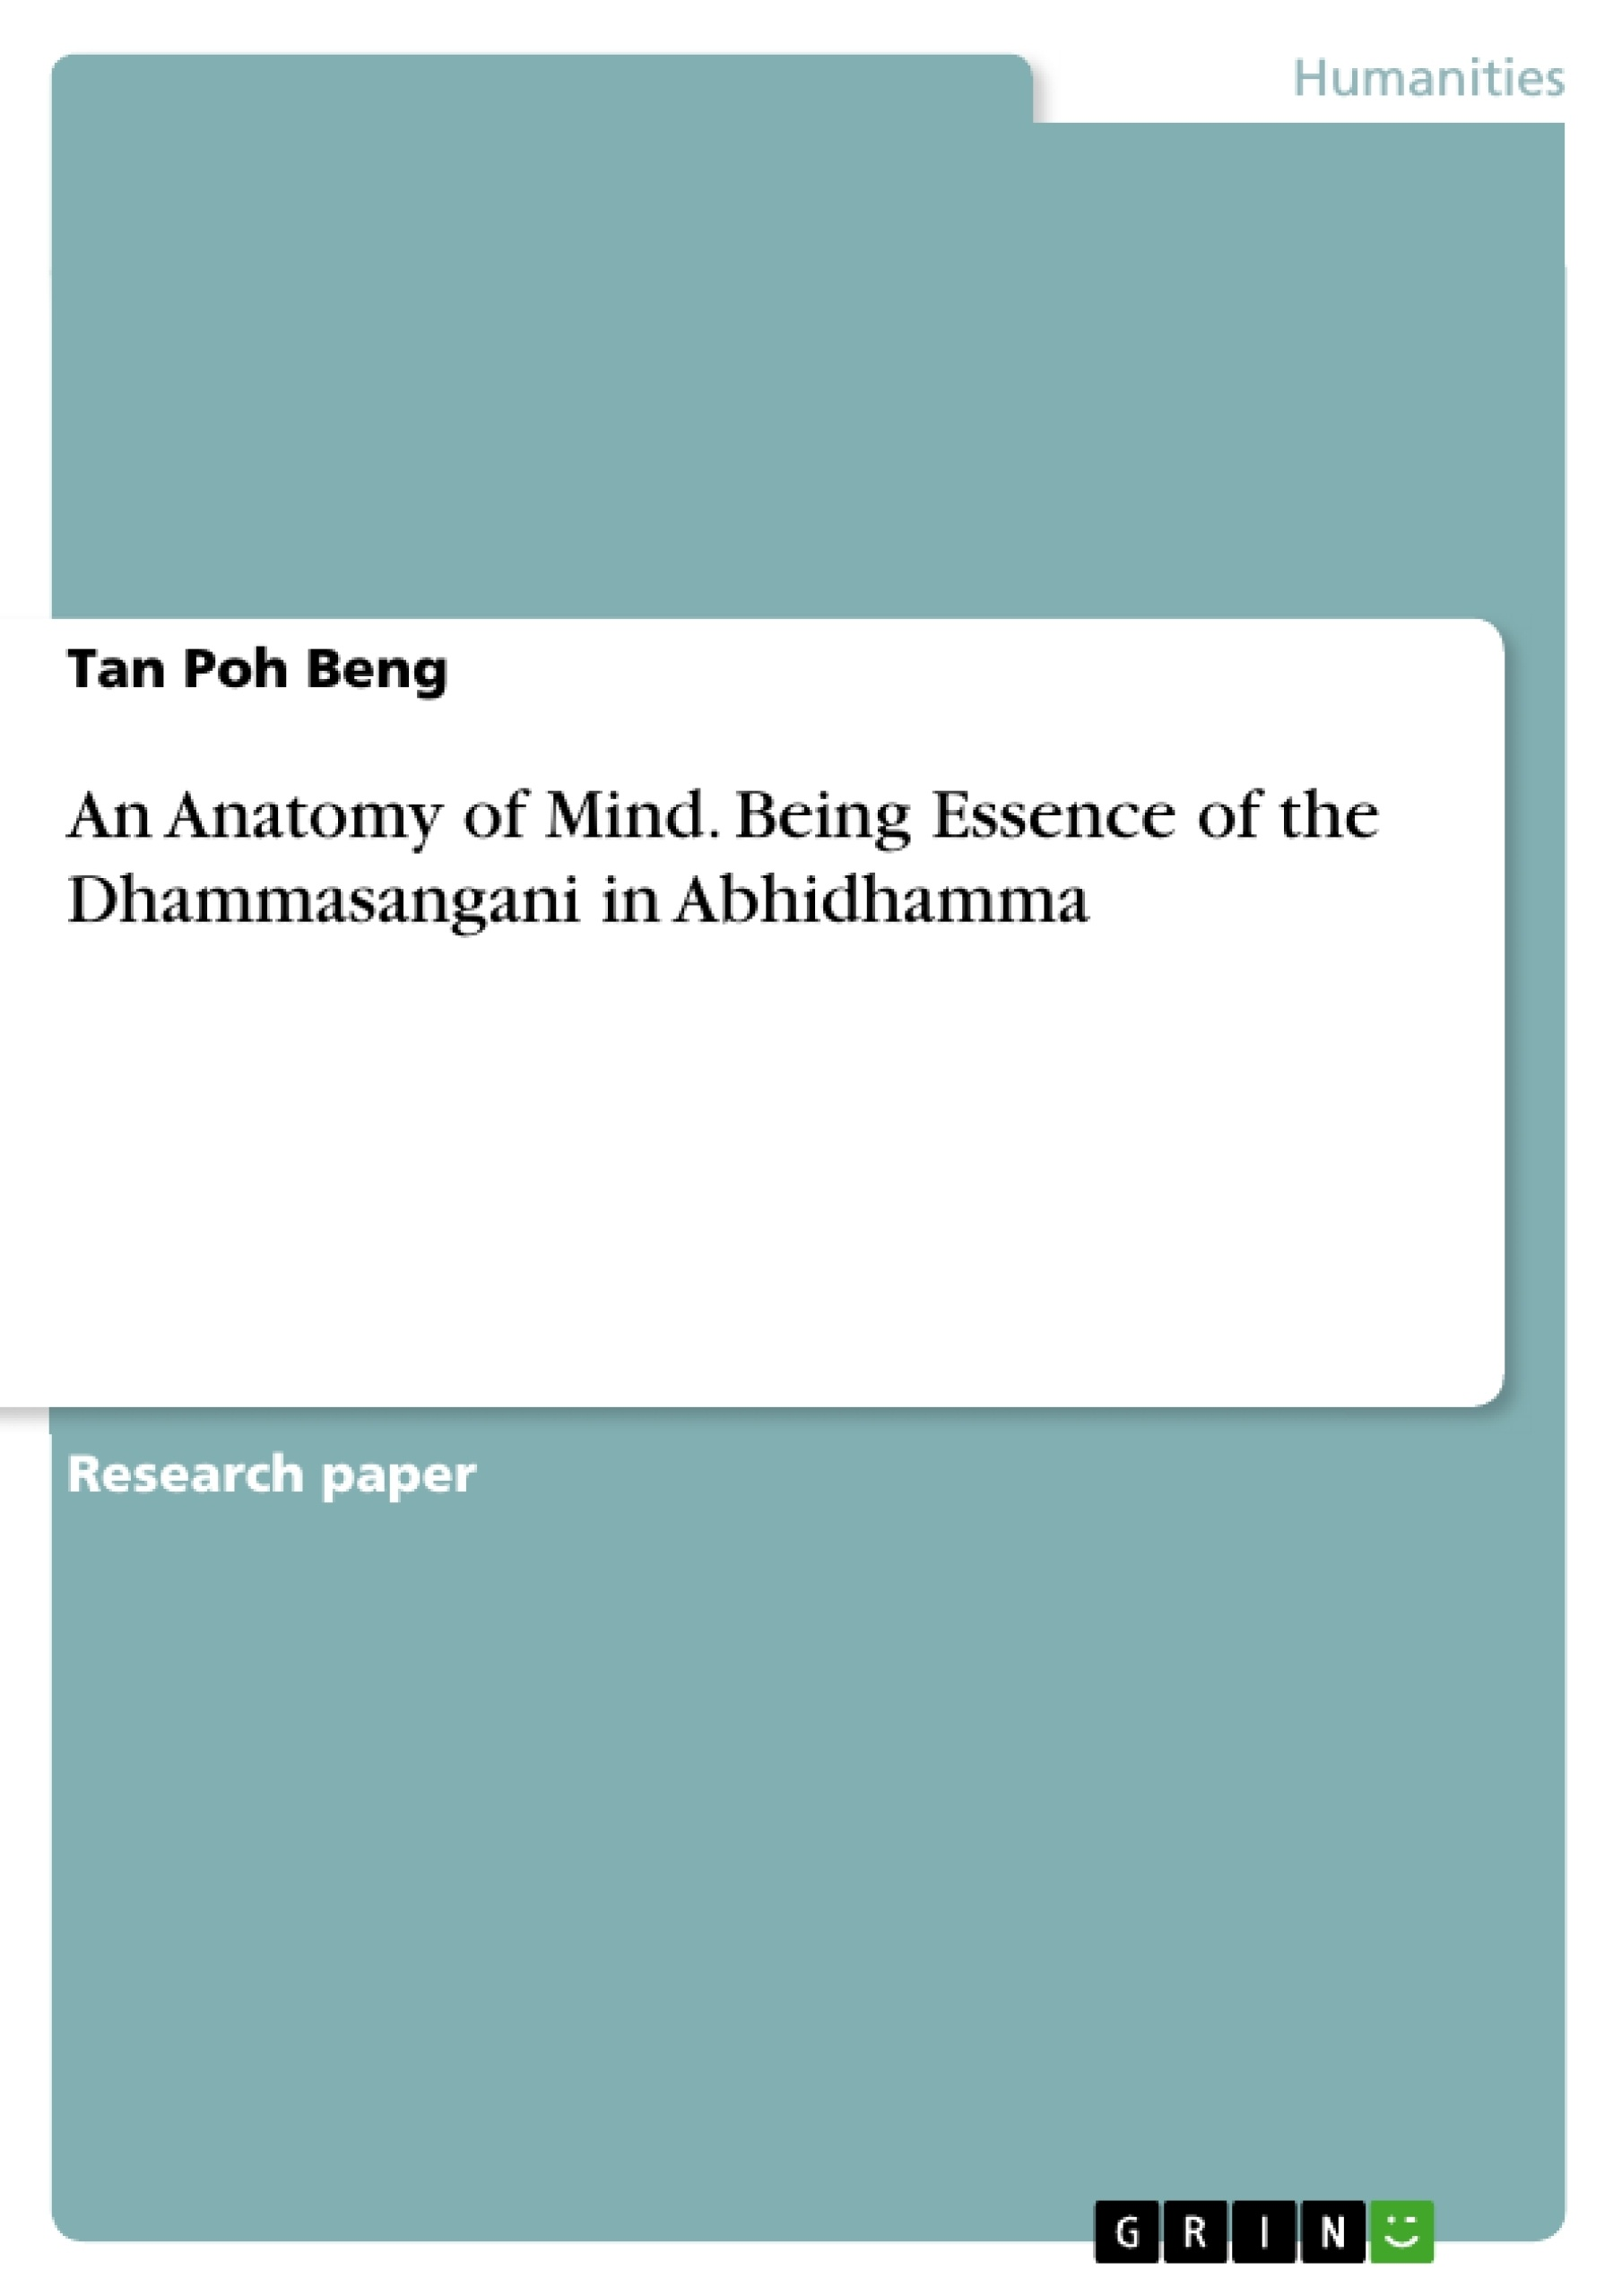 An Anatomy Of Mind Being Essence Of The Dhammasangani In Abhidhamma